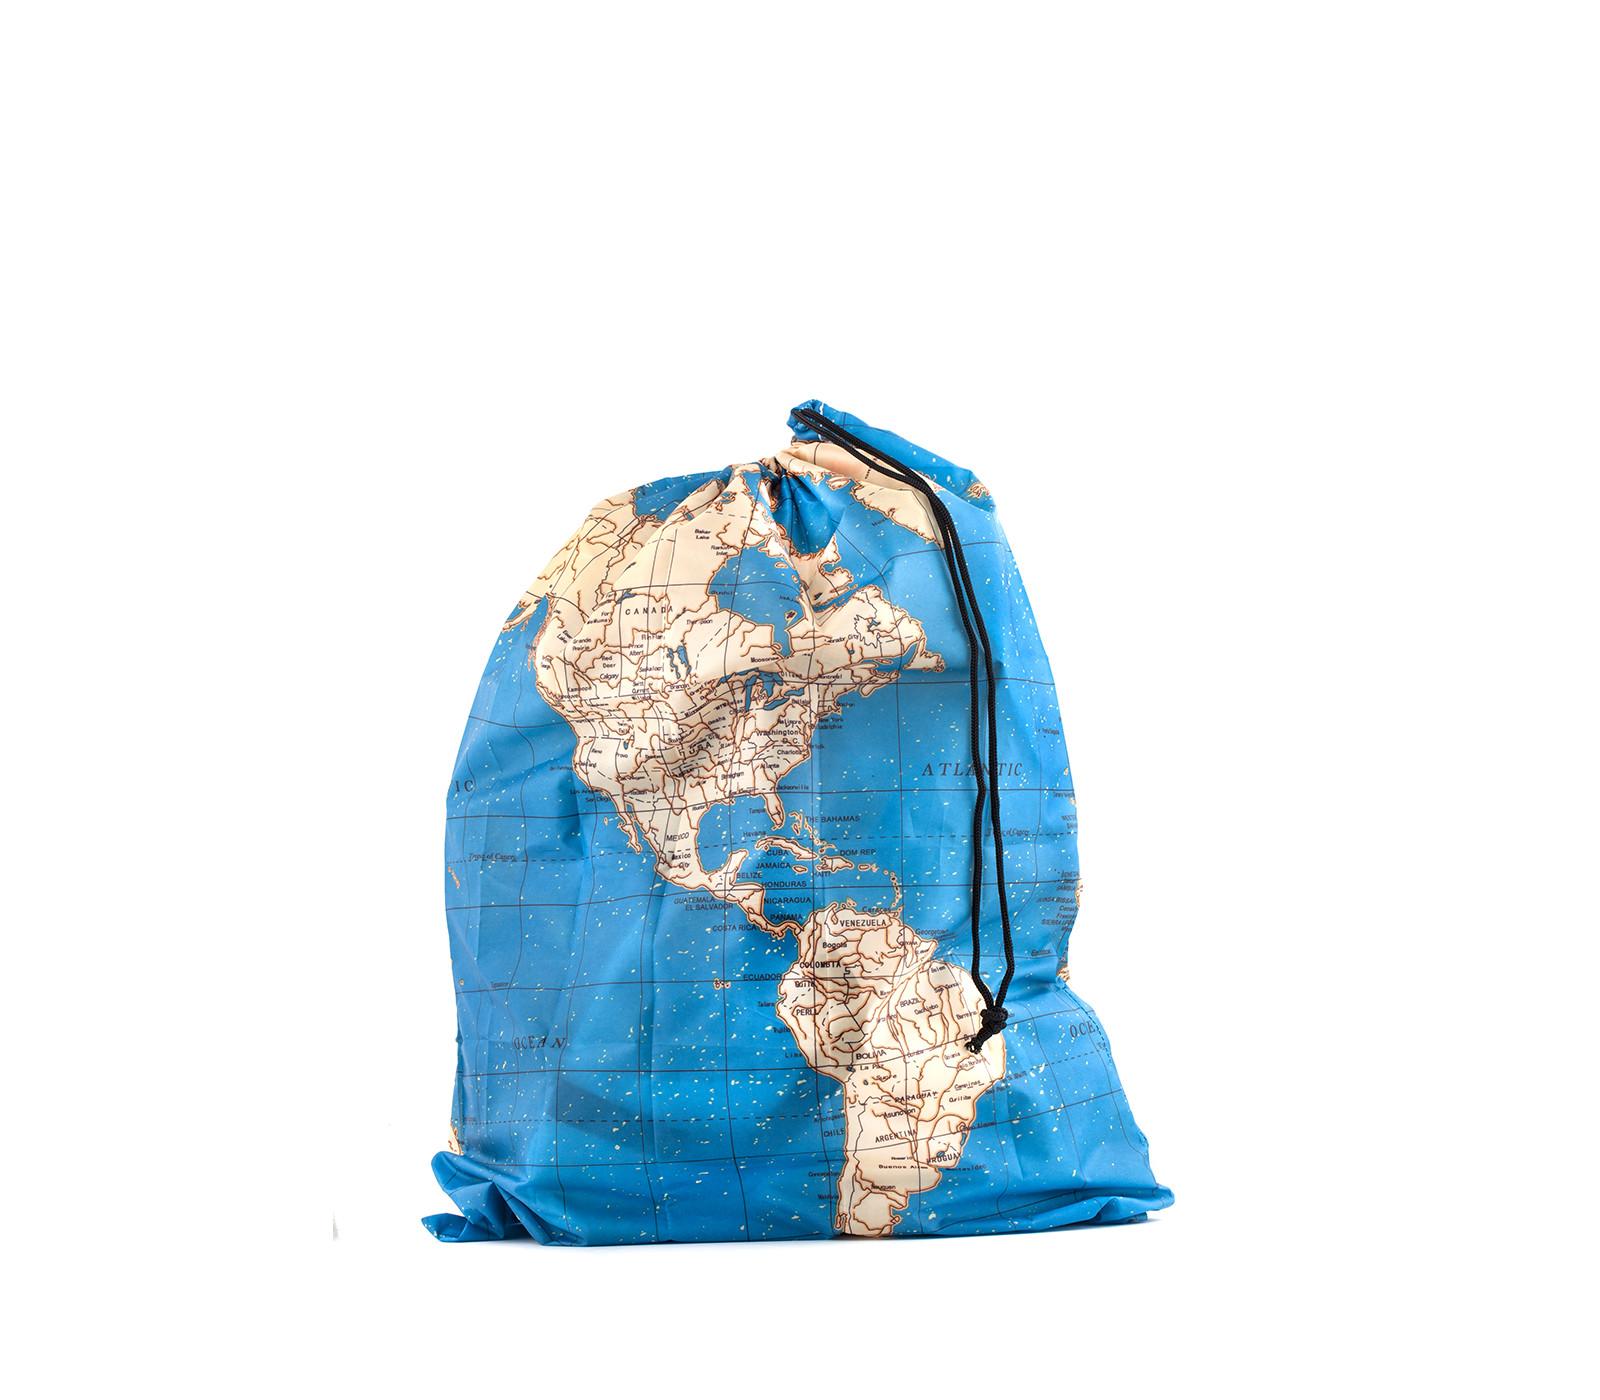 Kikkerland Around The World Travel Bag Set